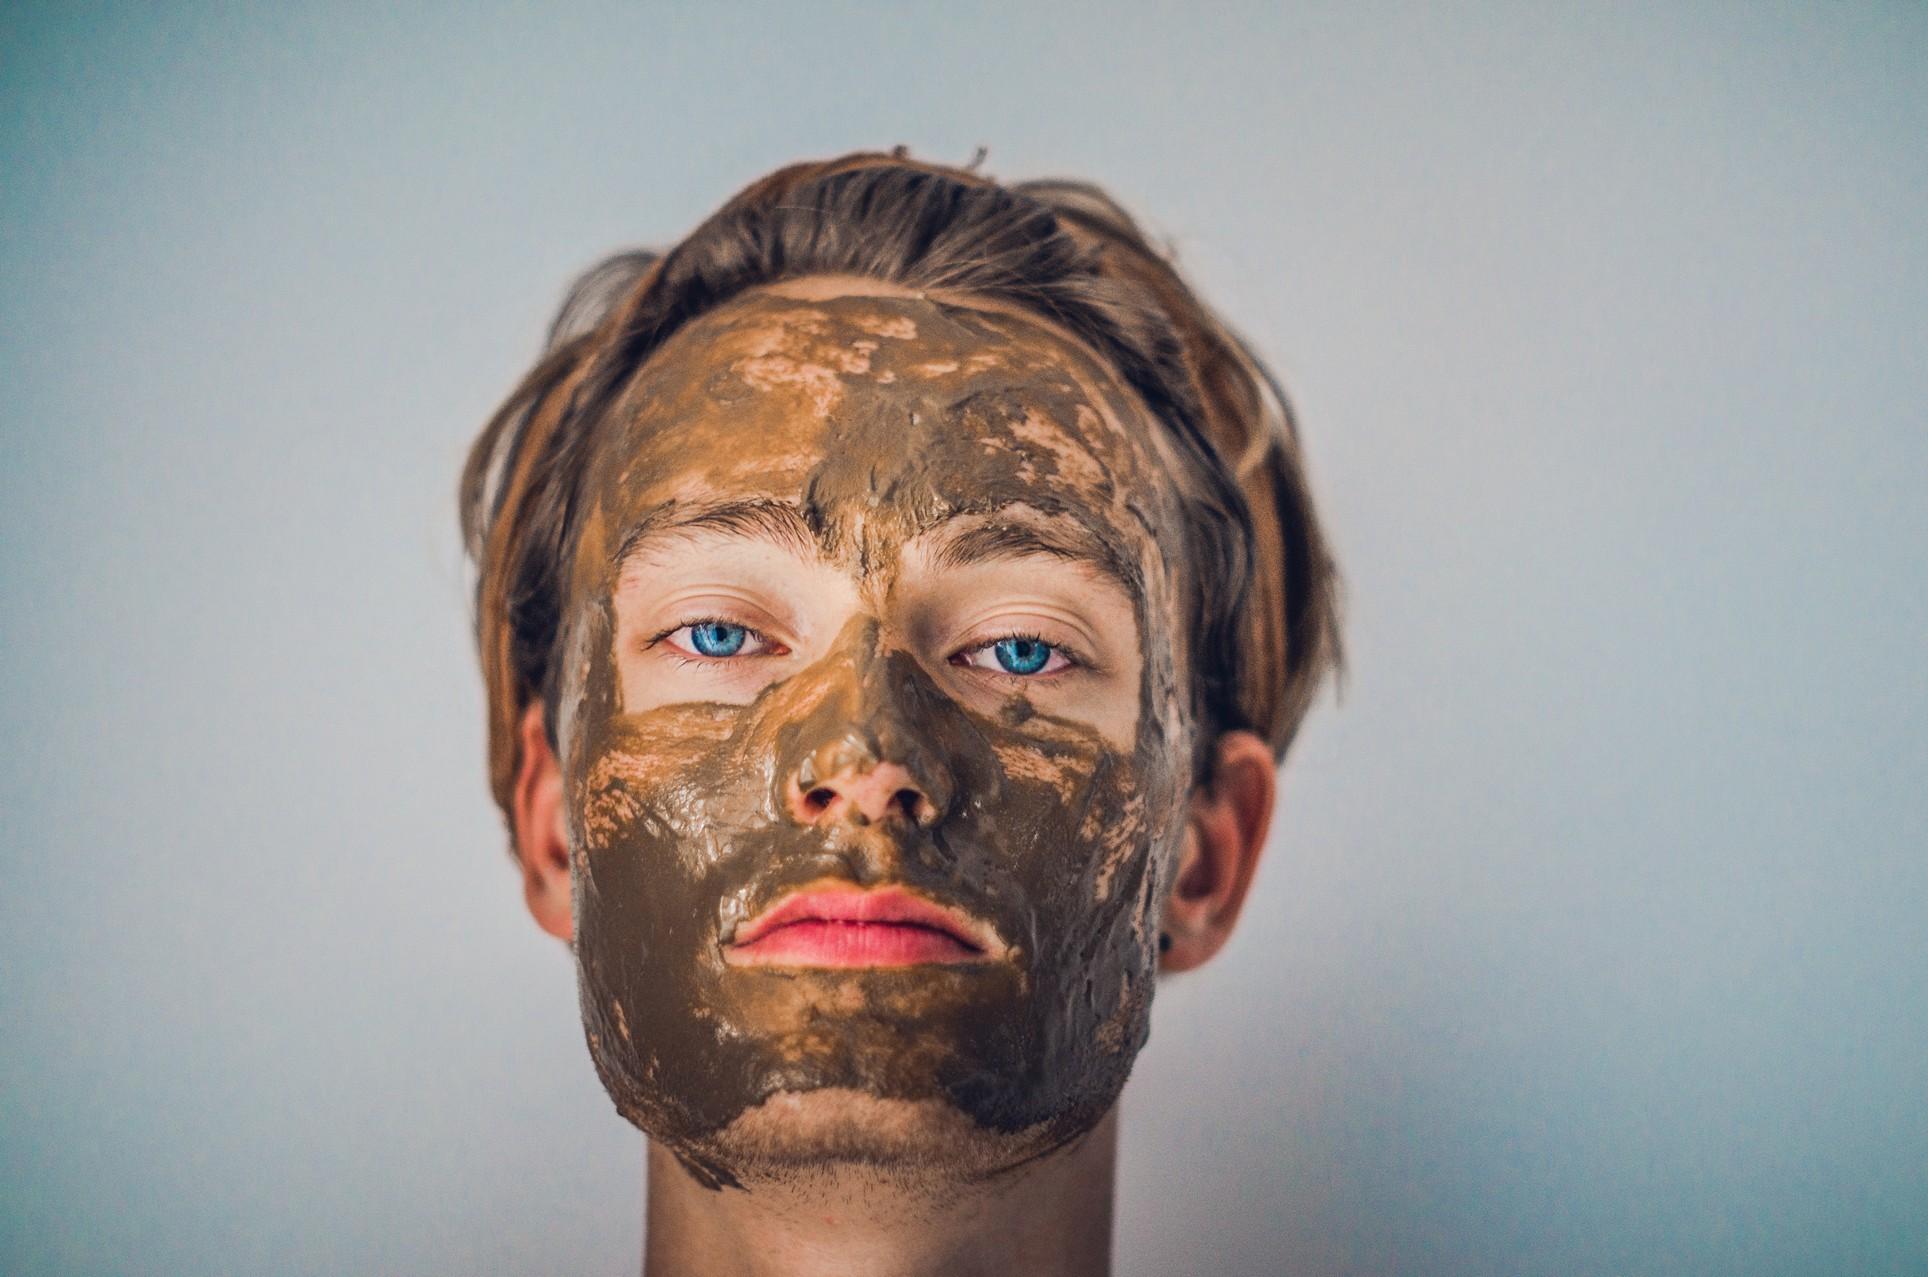 man wearing a mud face mask.